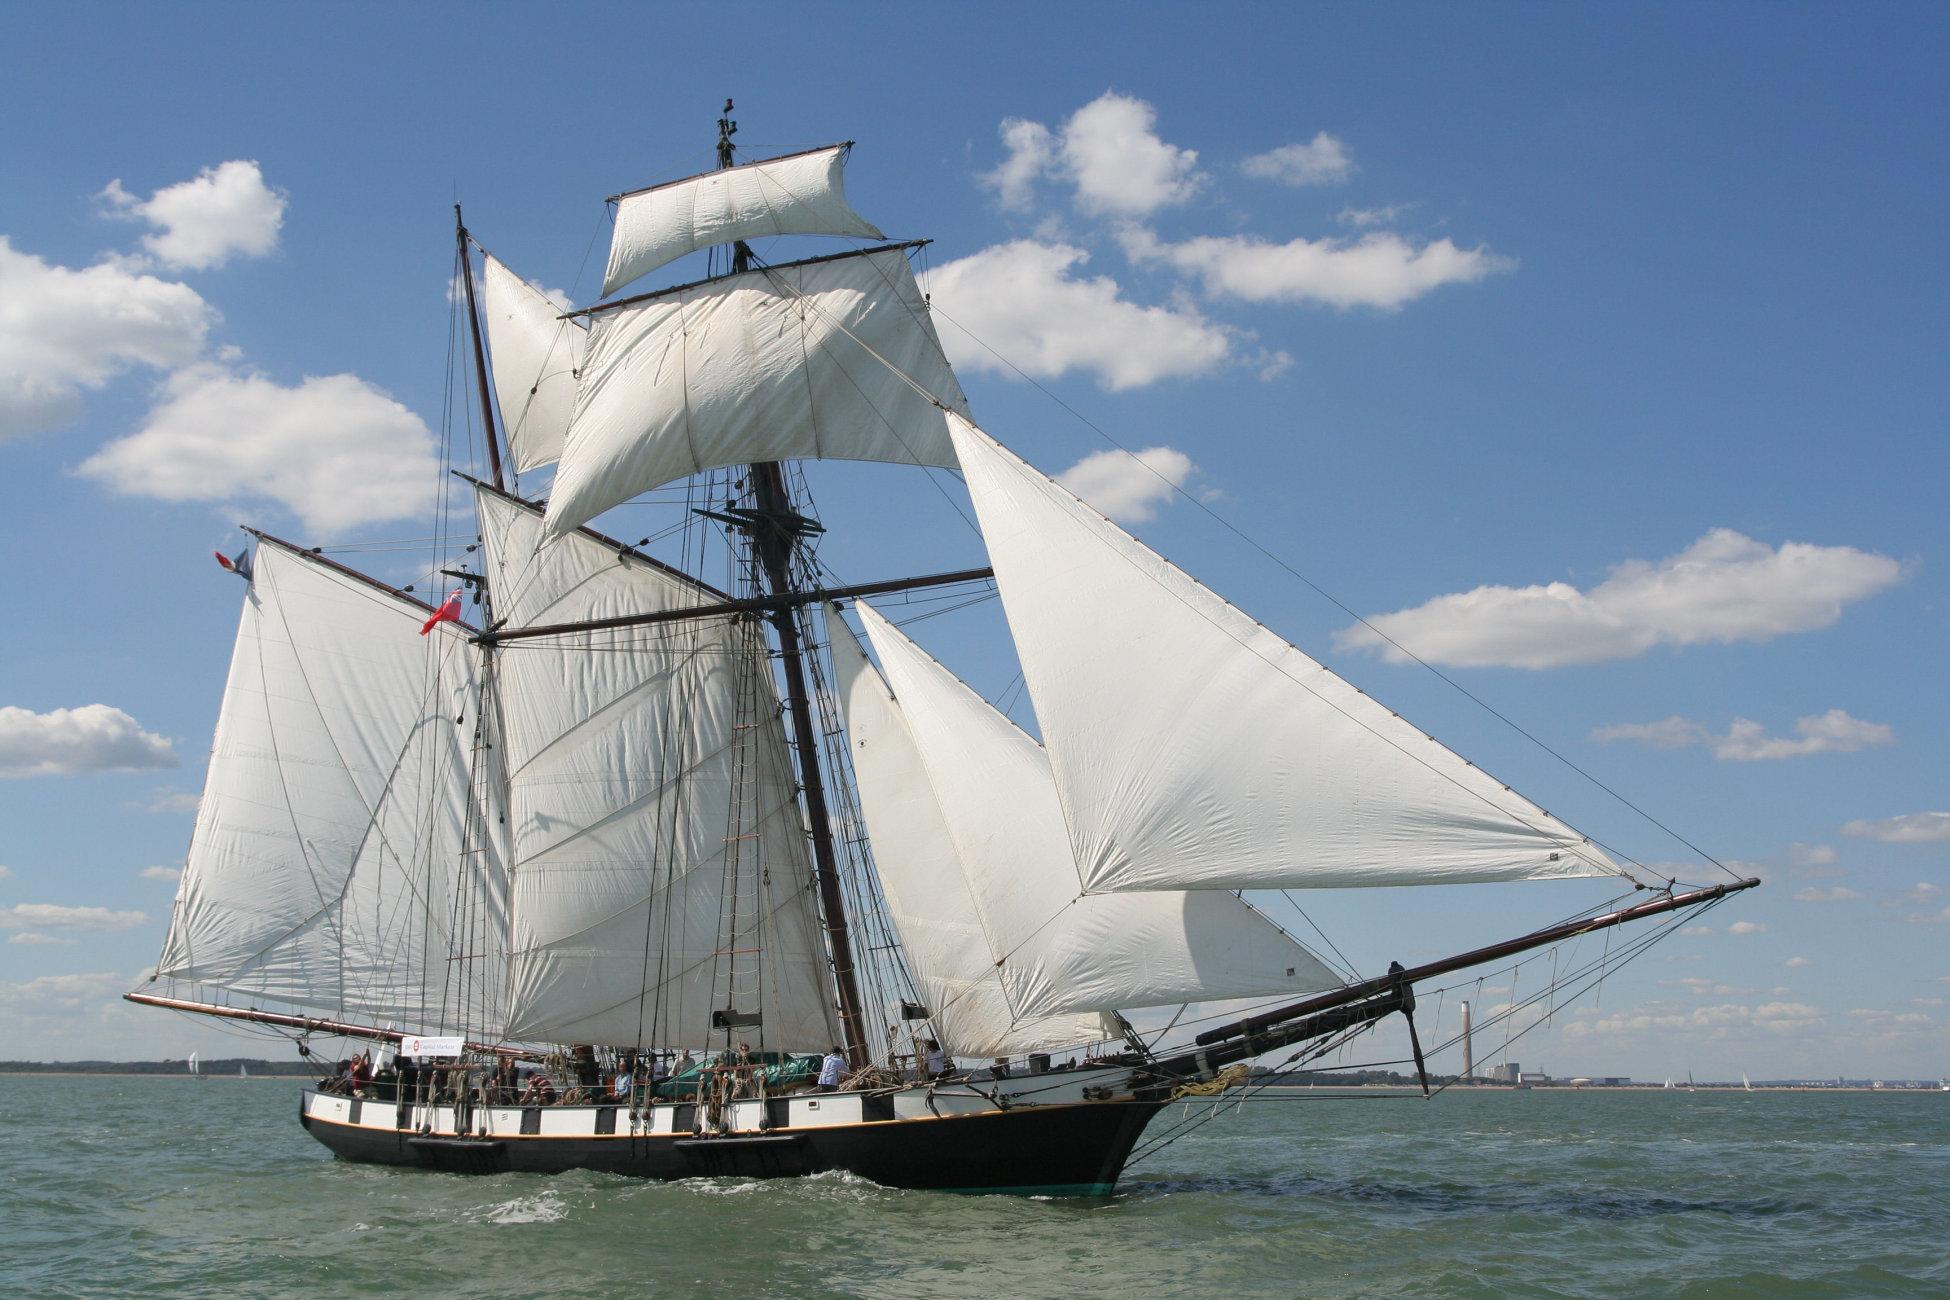 Full sail on HM training ship